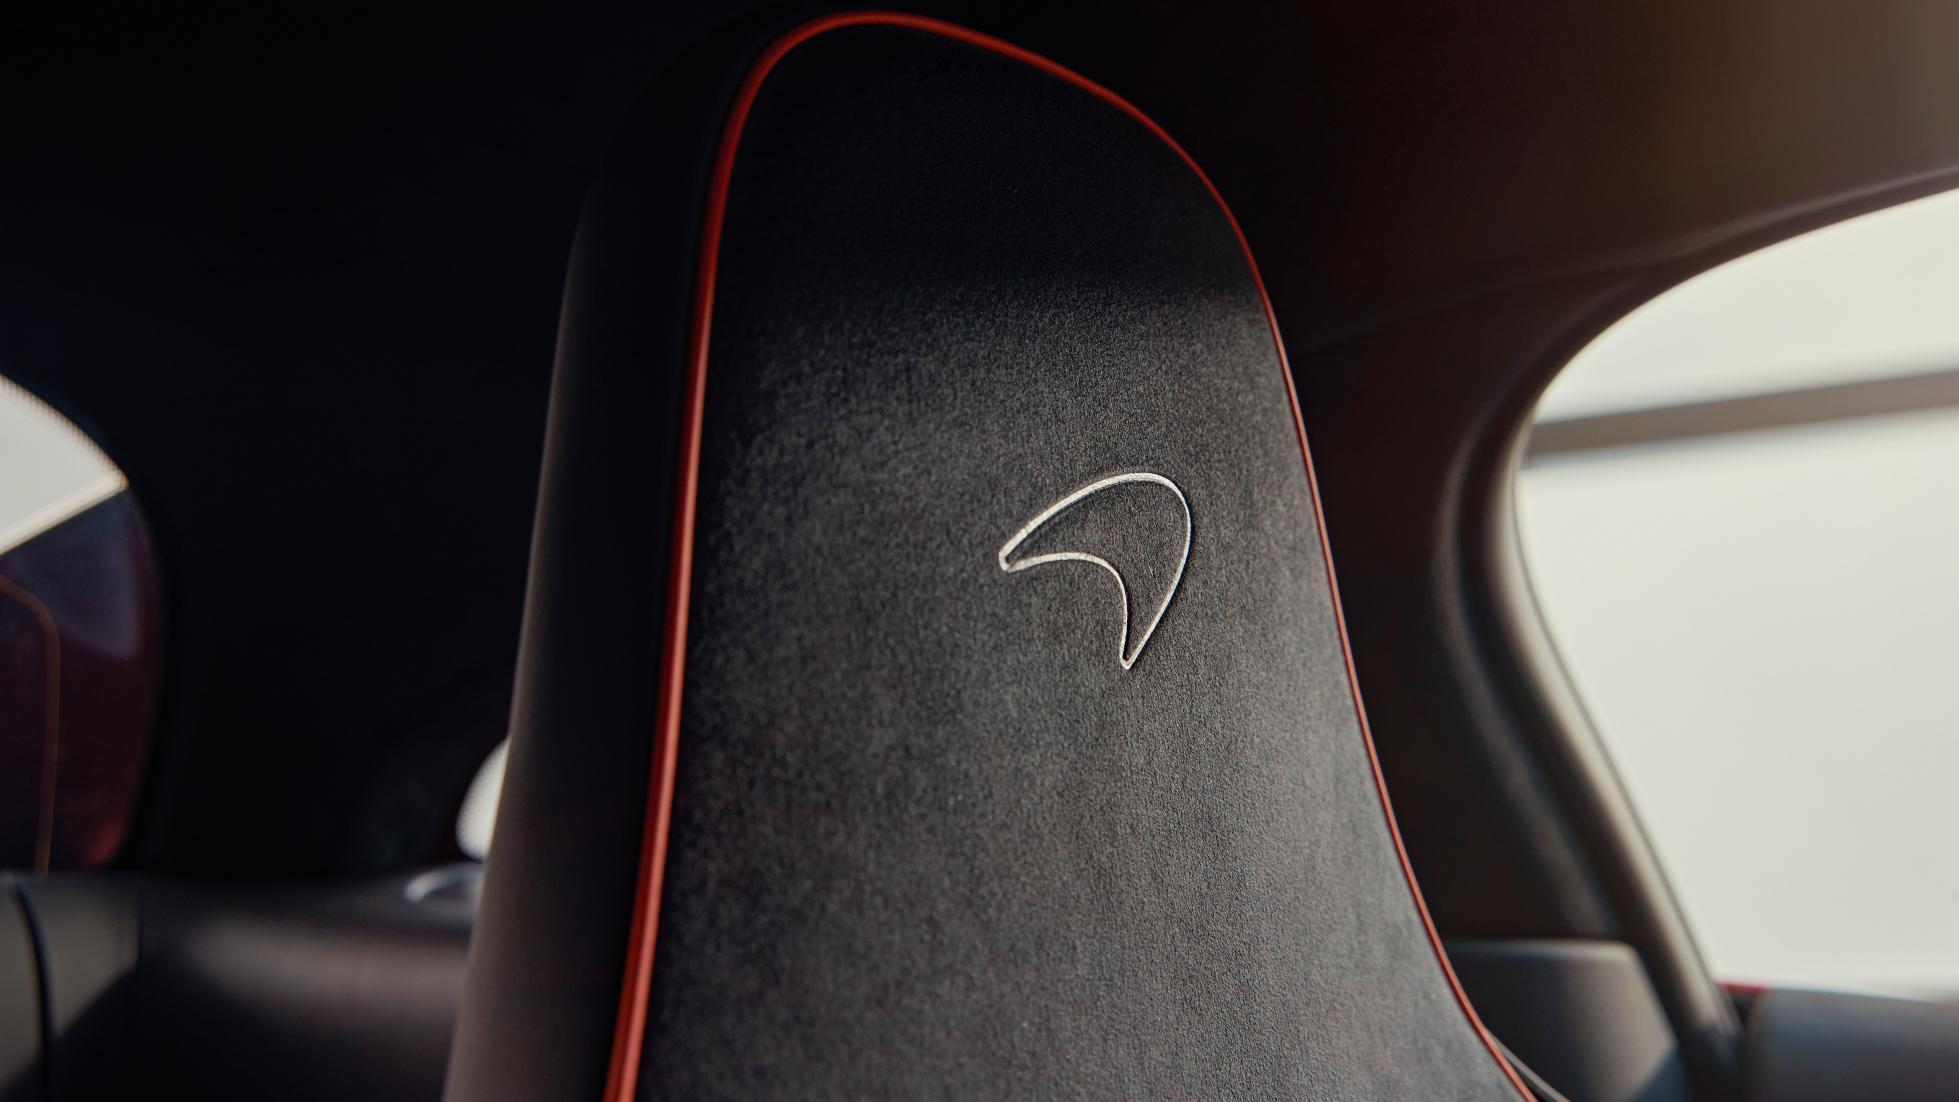 McLaren Artura passenger's seat detail